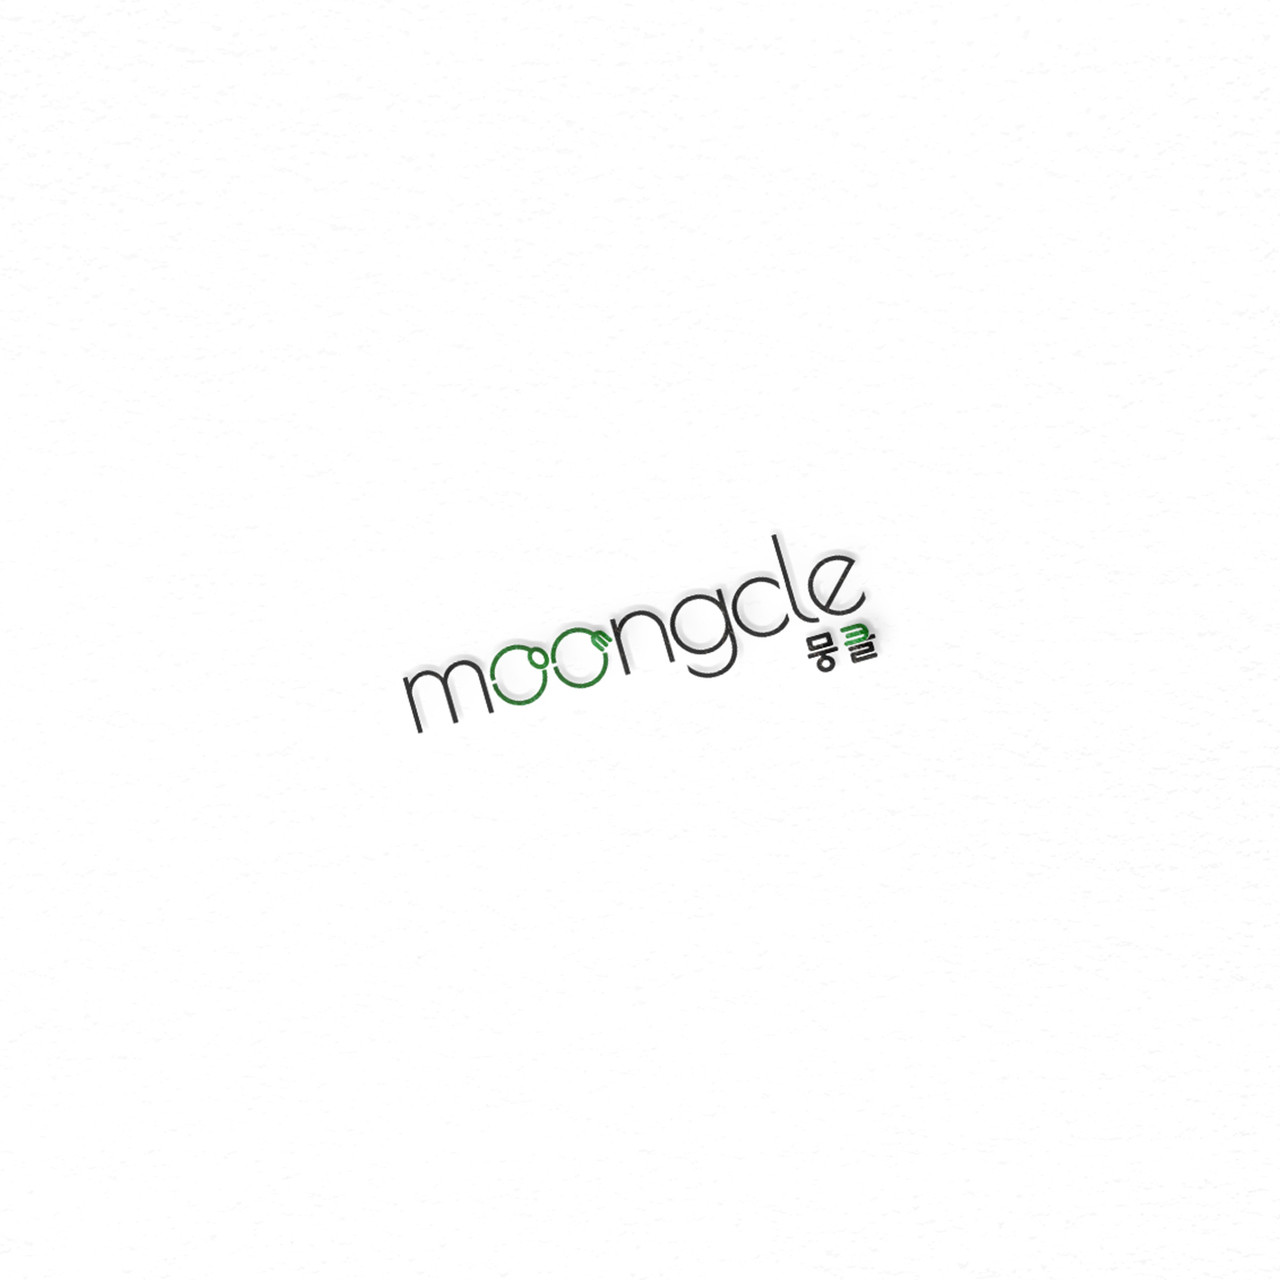 moongcle 뭉클 로고 디자인